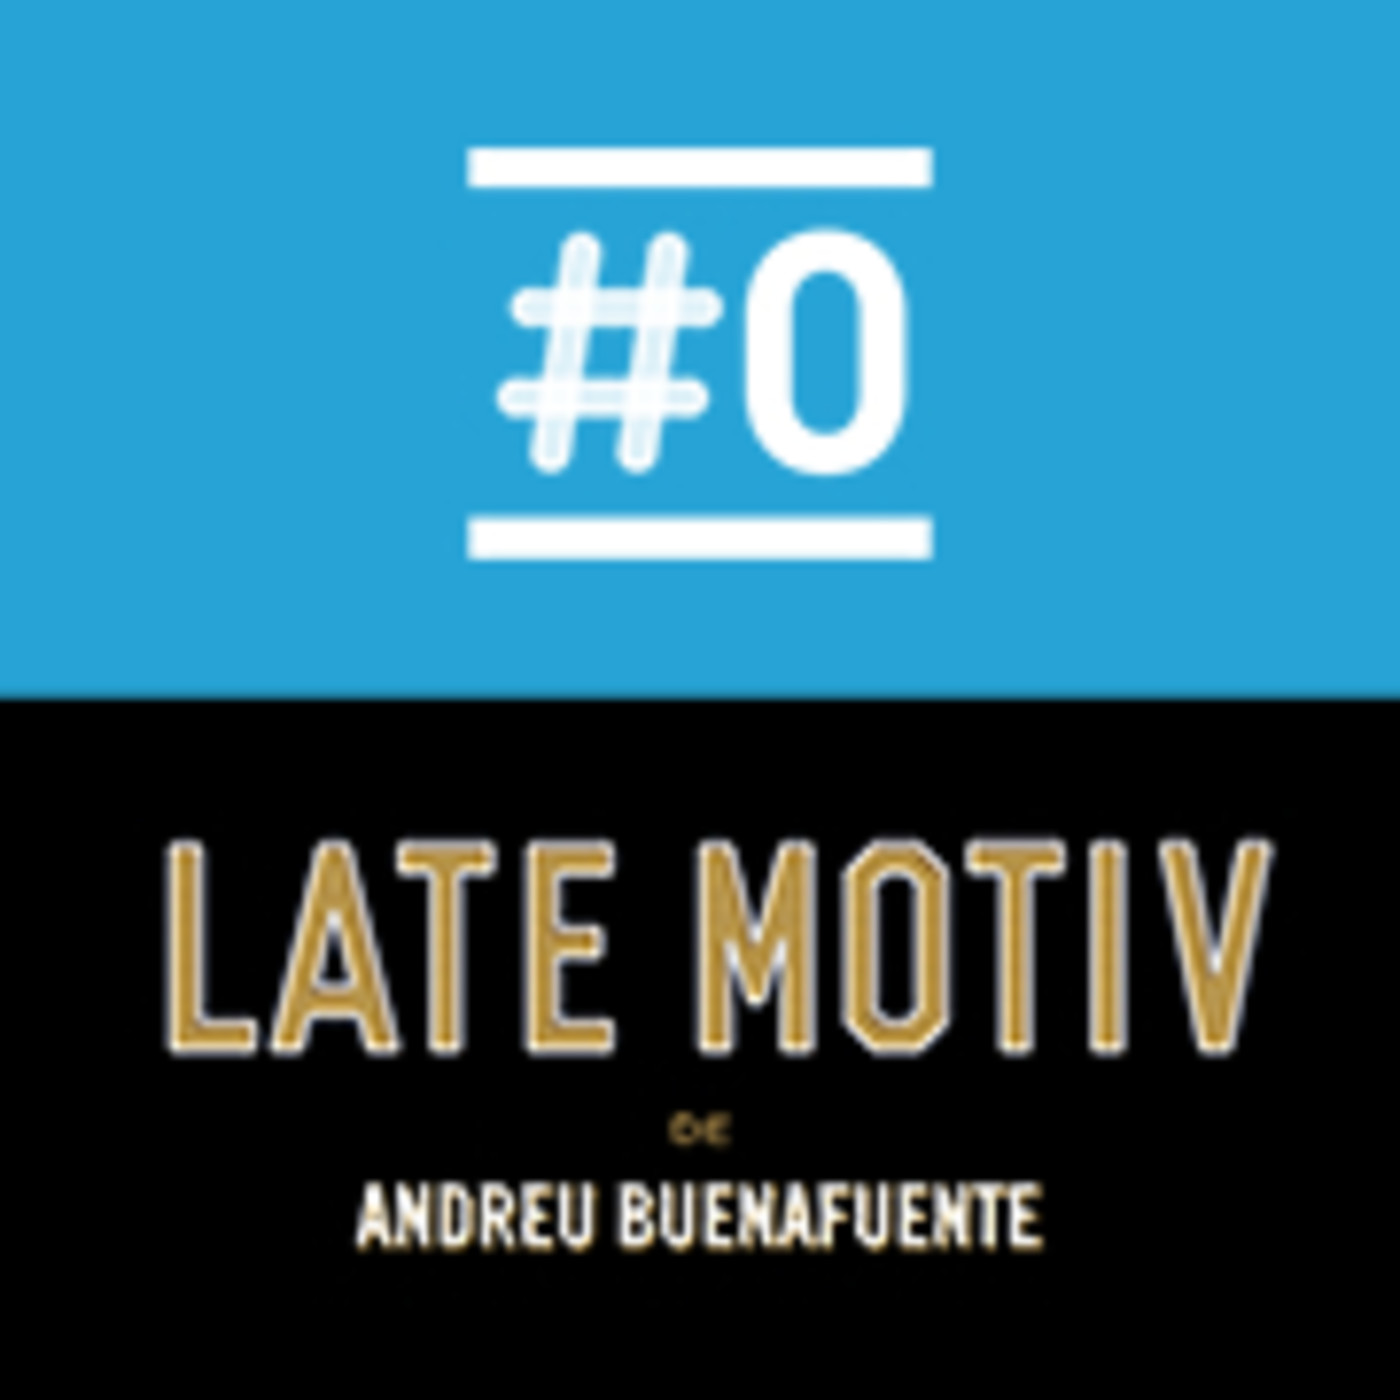 LATE MOTIV 576 - Programa completo